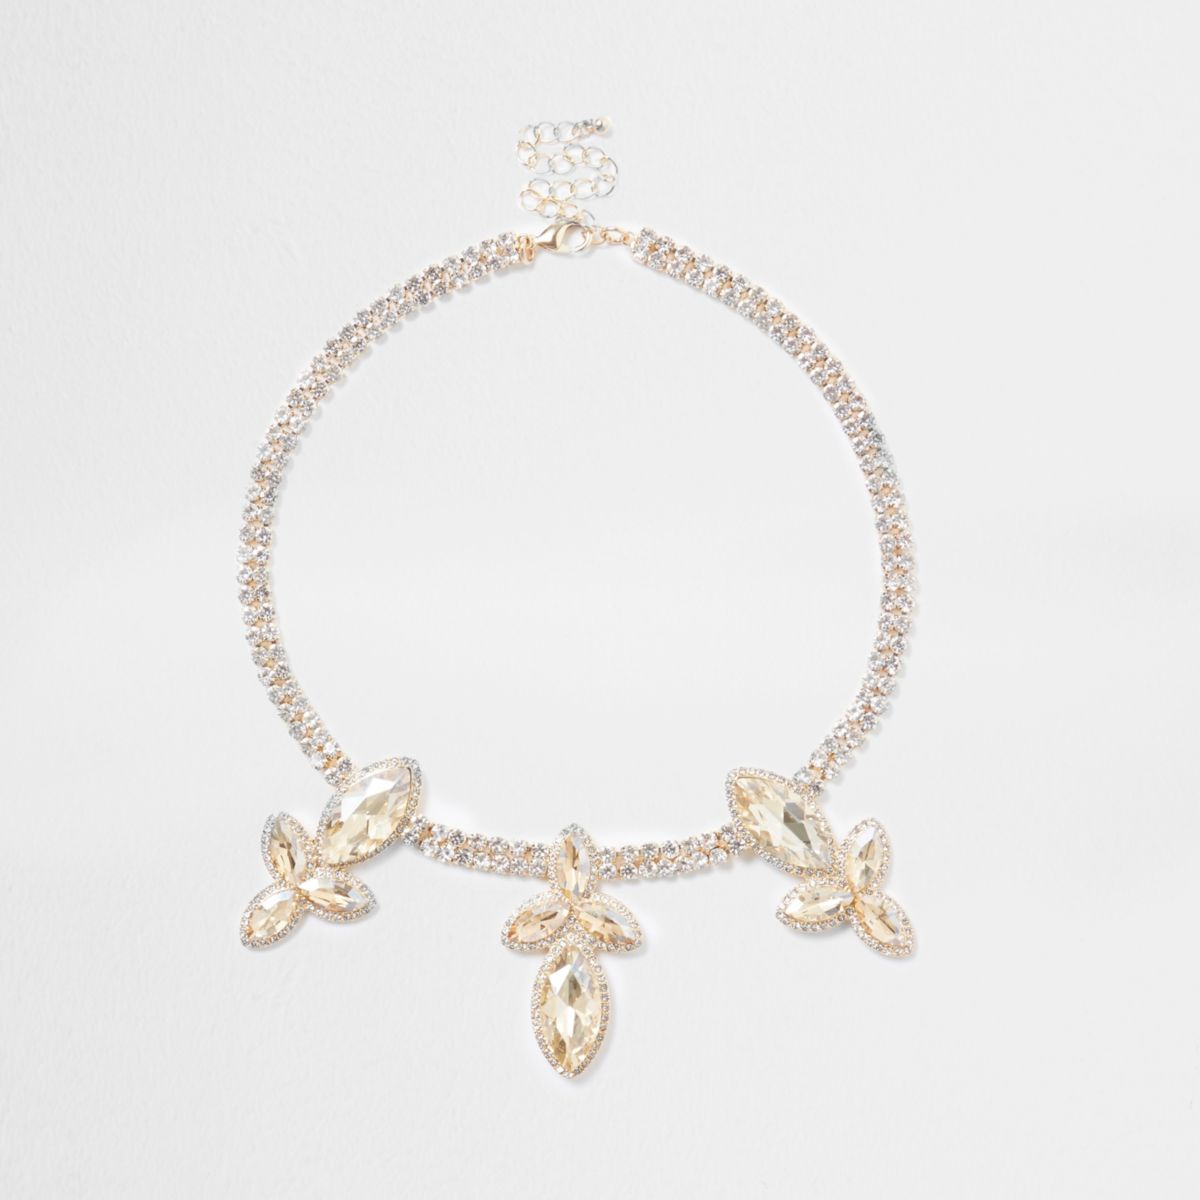 Gold tone rhinestone leaf jewel necklace